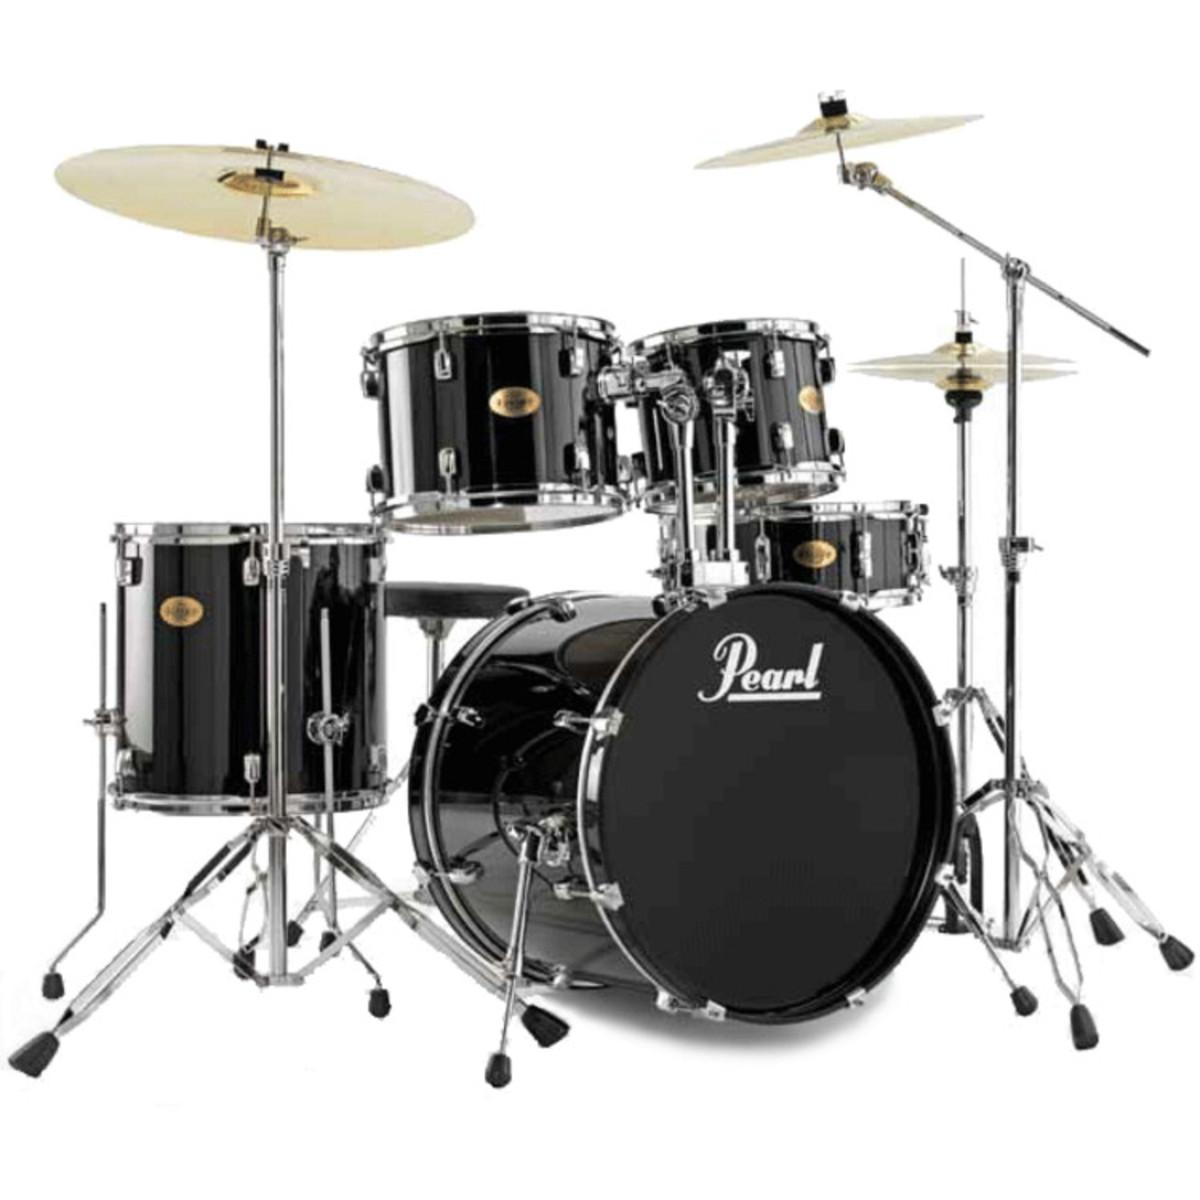 Disc Pearl Target Drum Kit Limited Edition Jet Black At